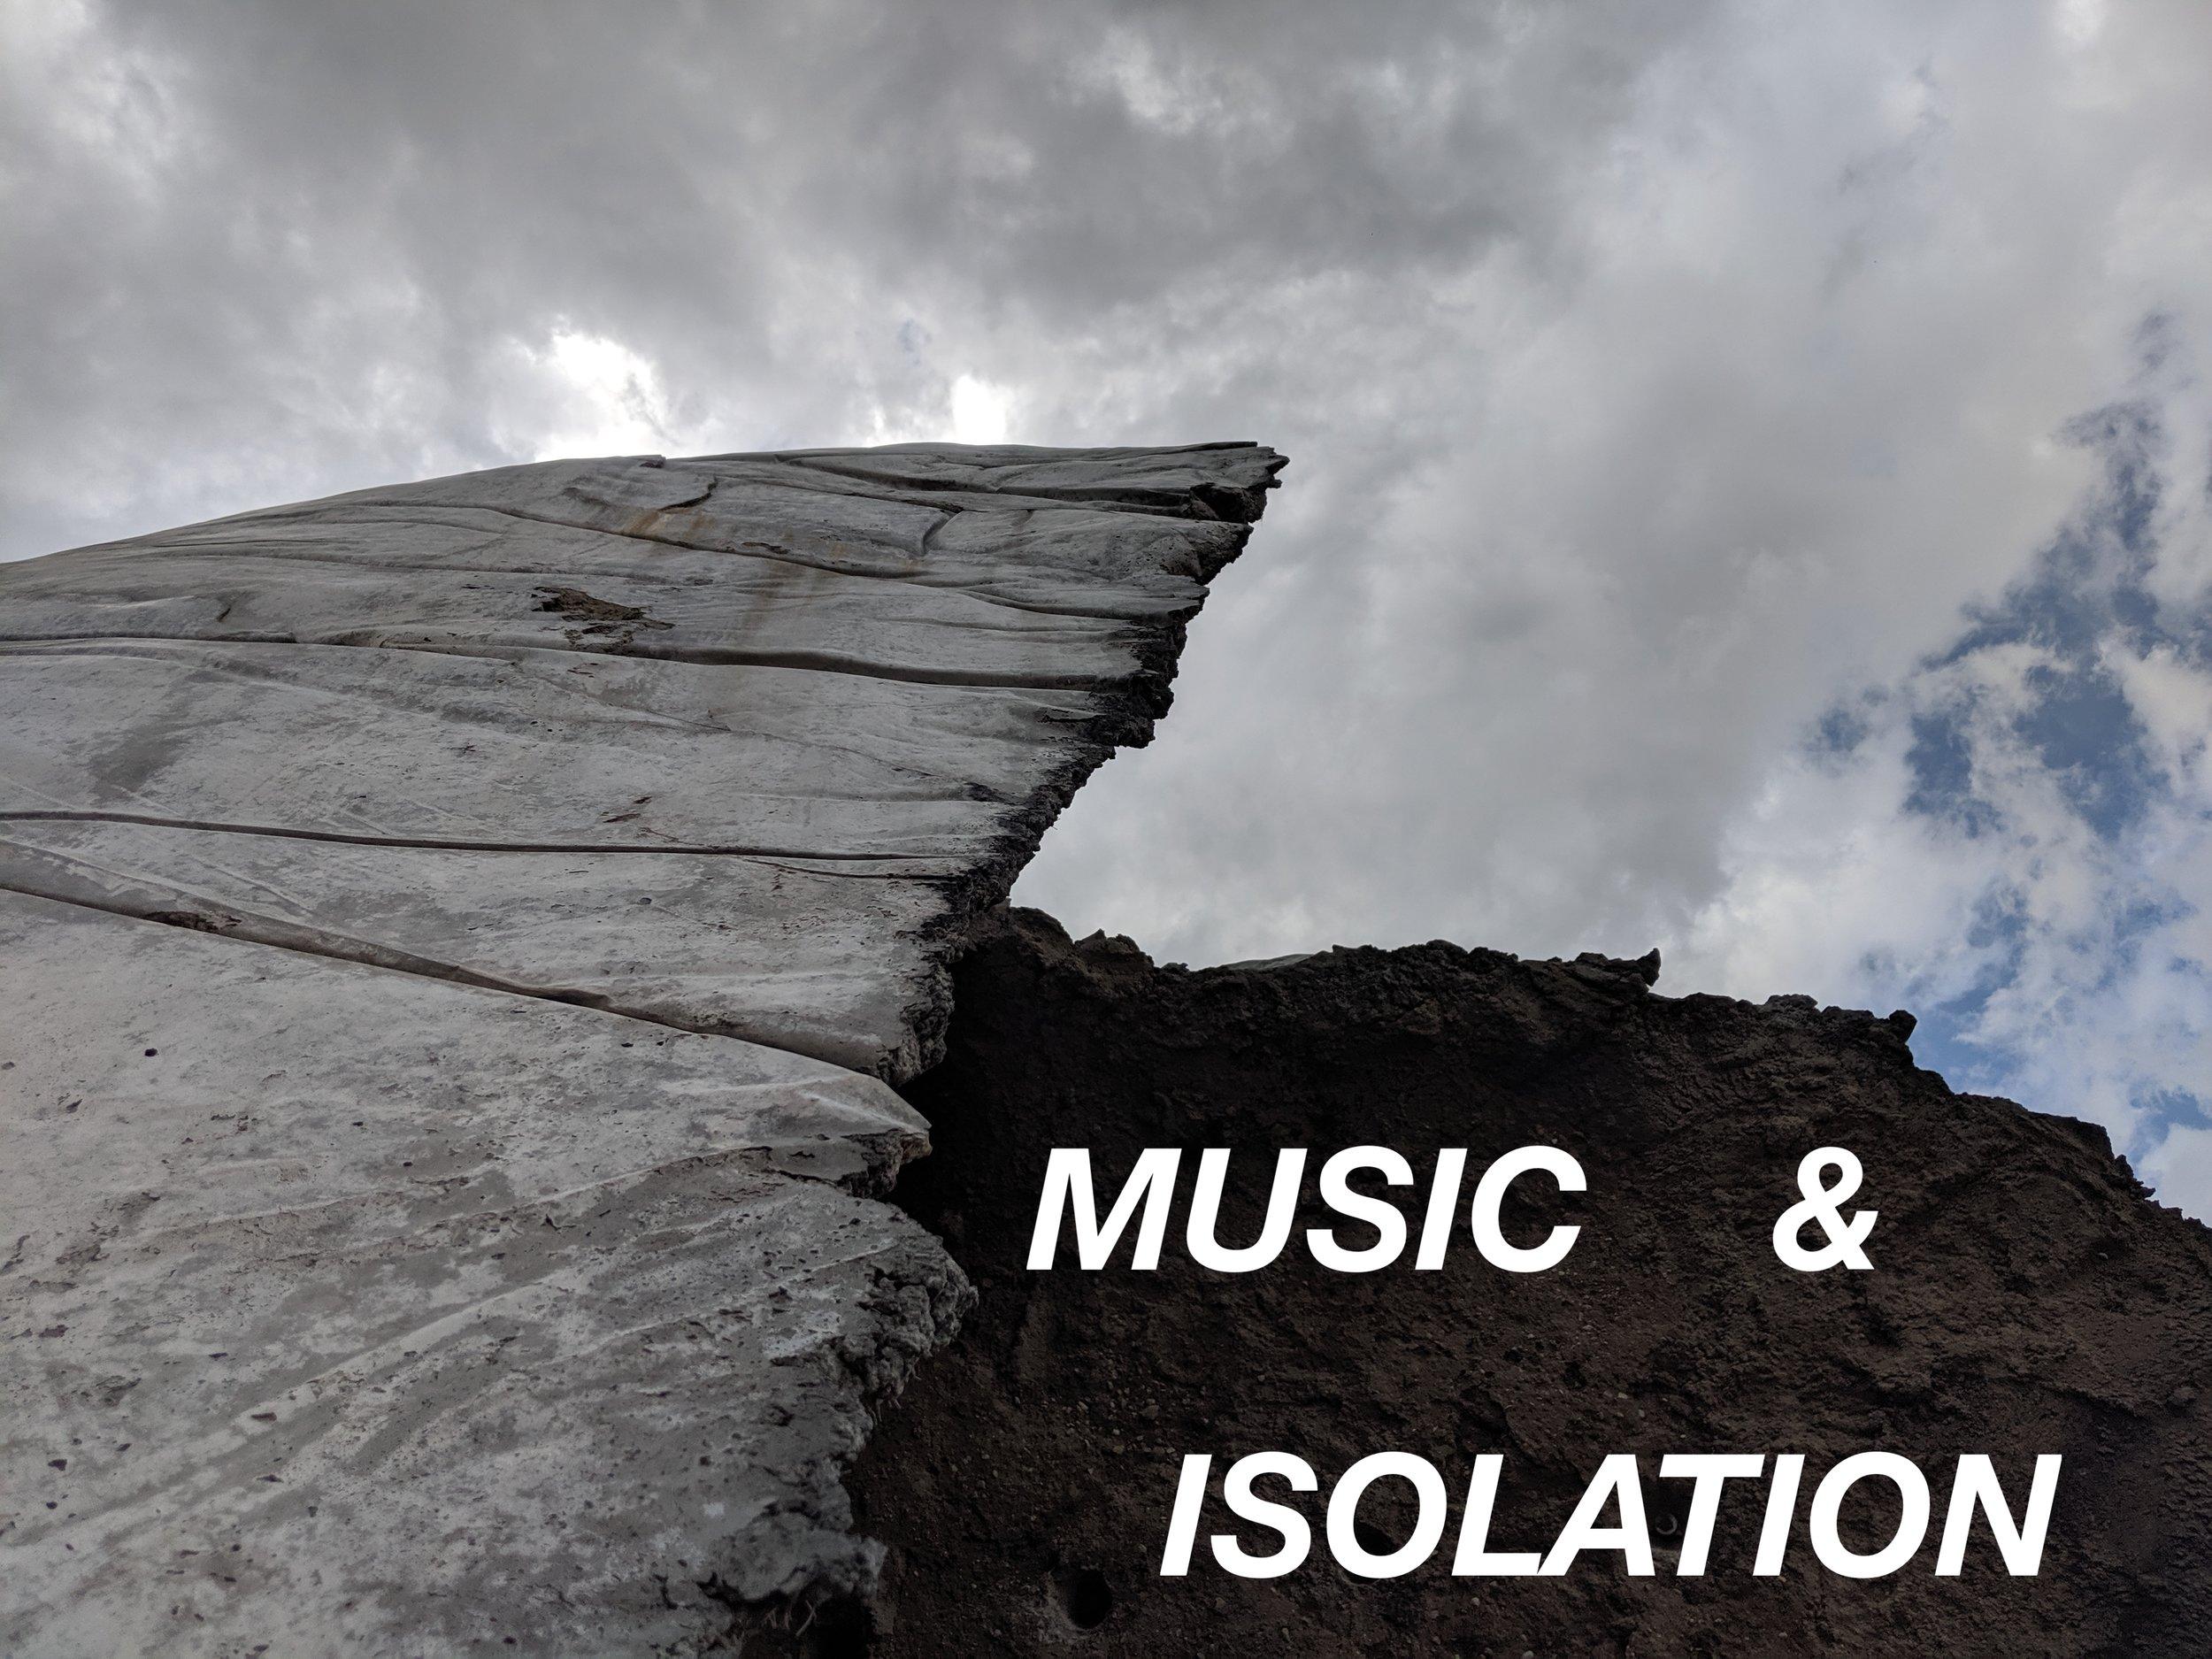 Music & Isolation Program Promo Photo.jpg